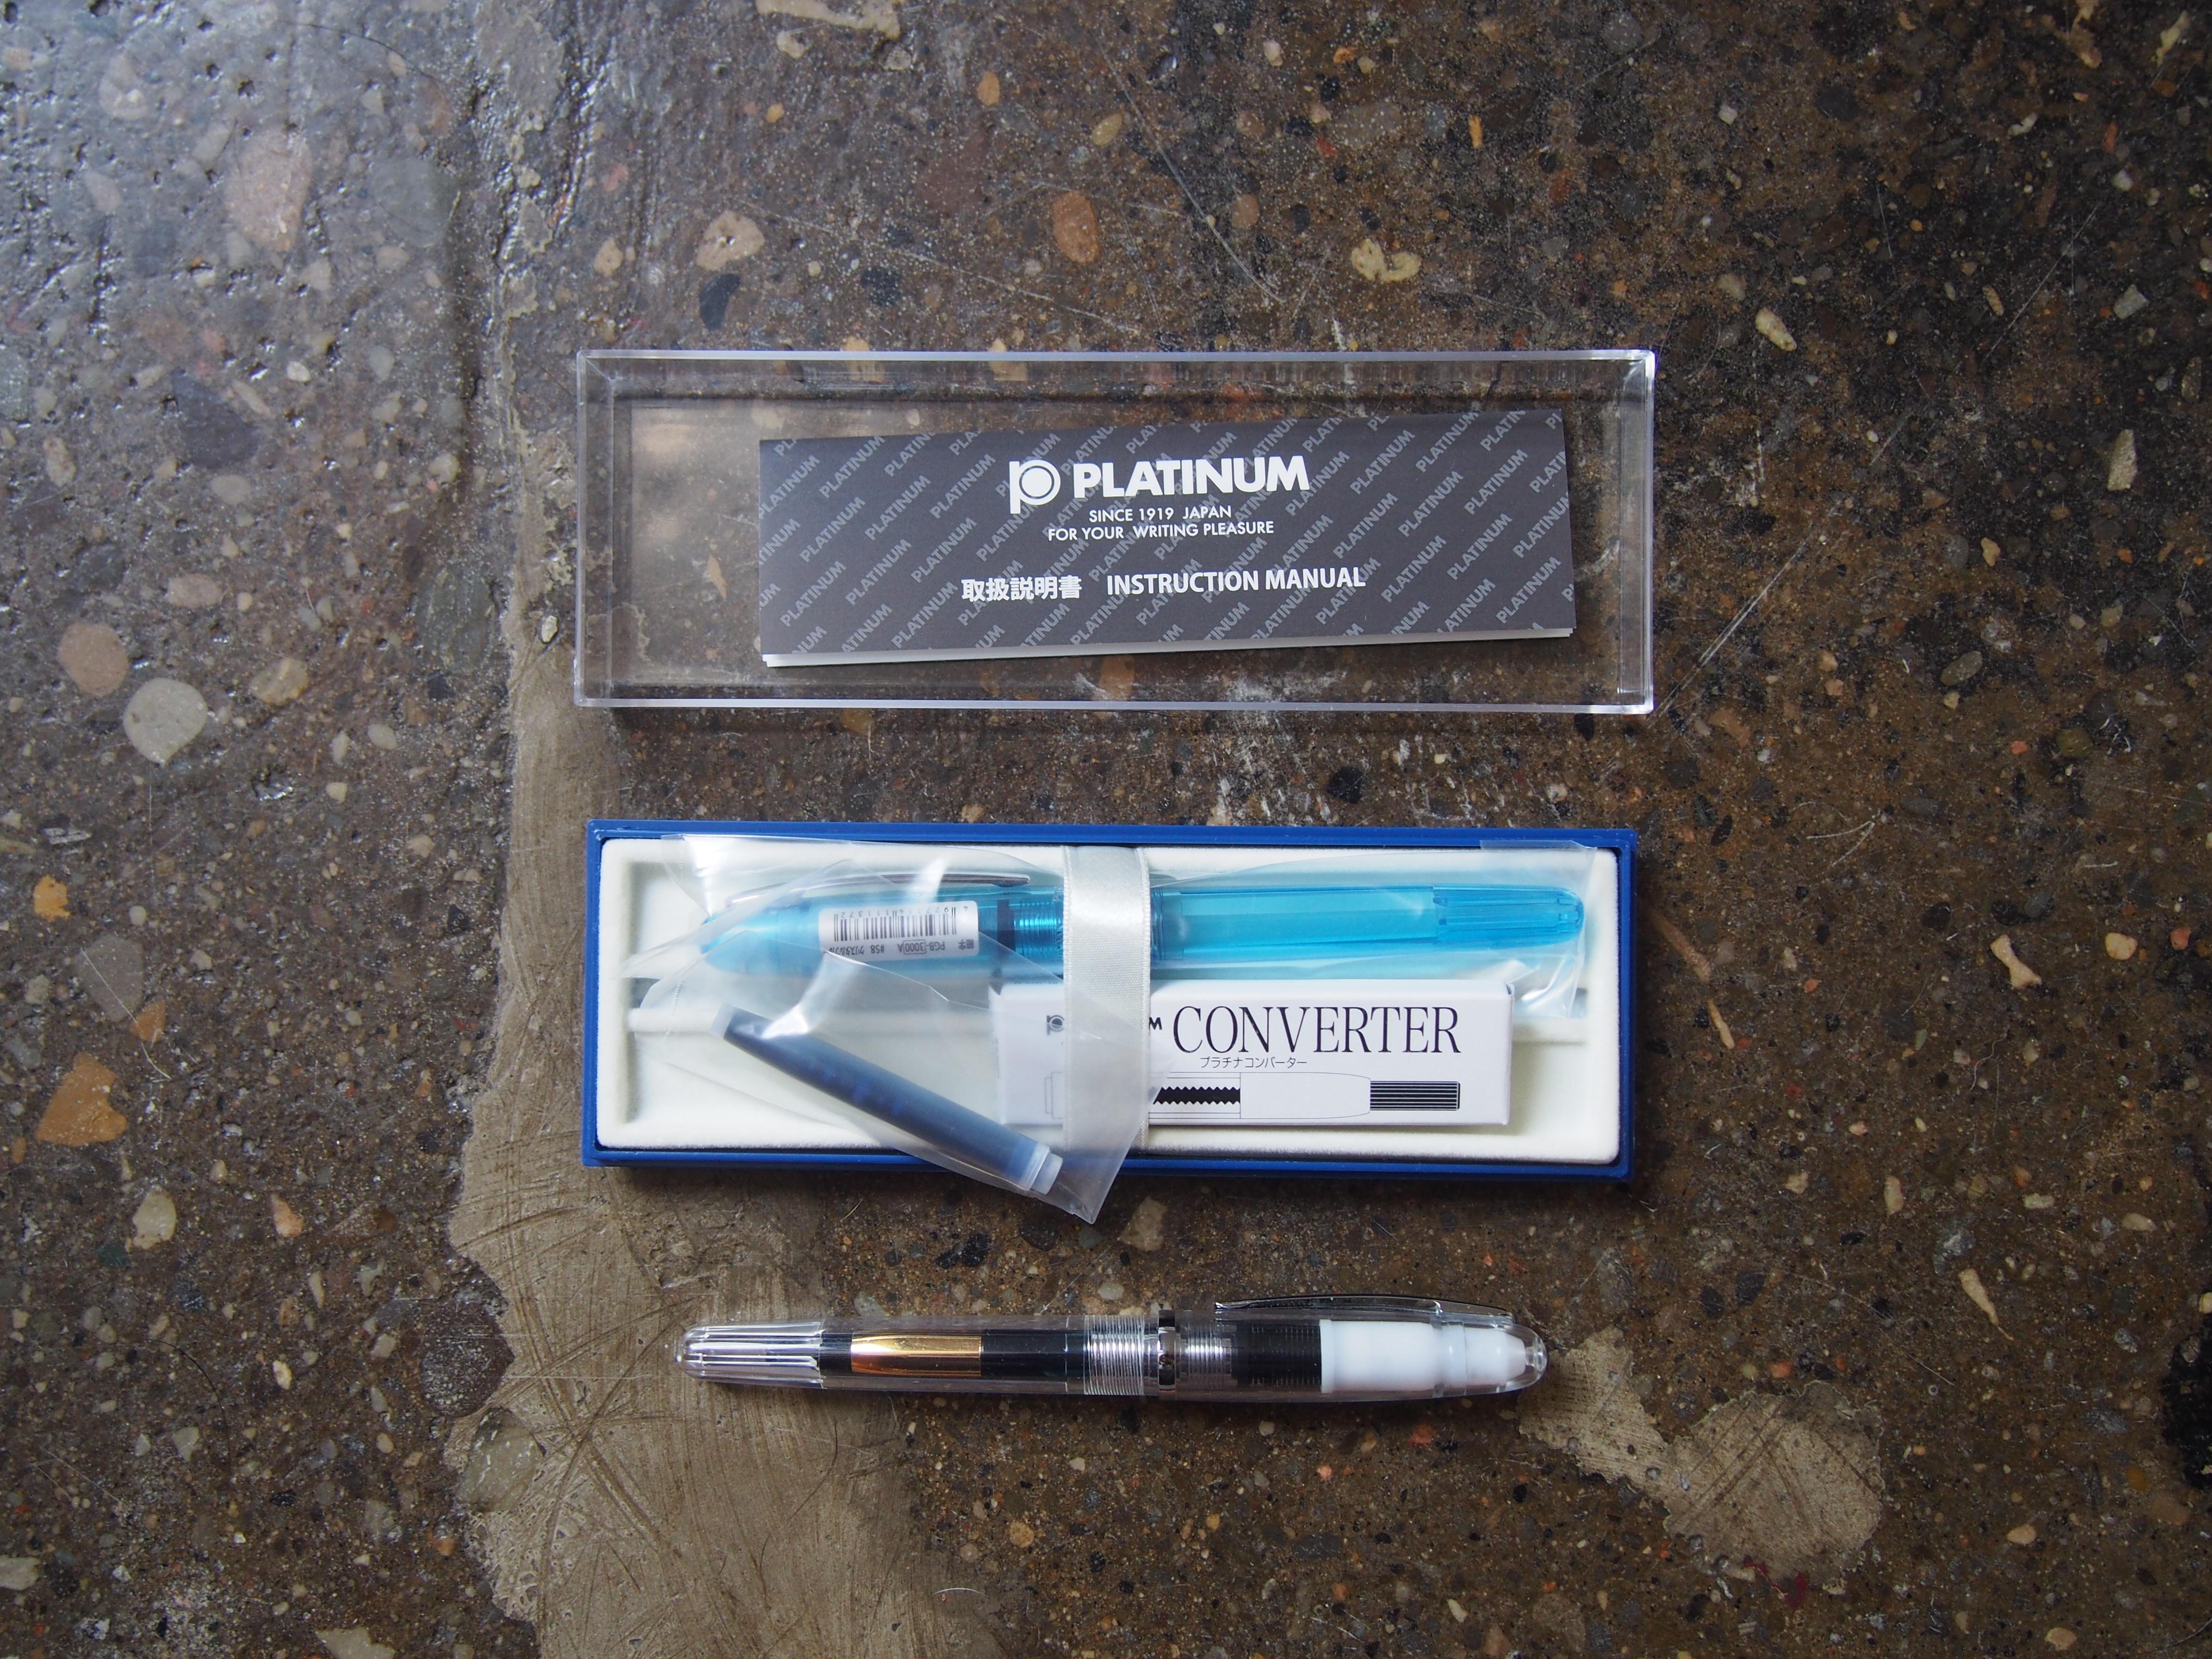 Platinum Cool Fountain pen Review Flex Nib Wonder Pens Wonderpens.ca Blog Toronto Canada